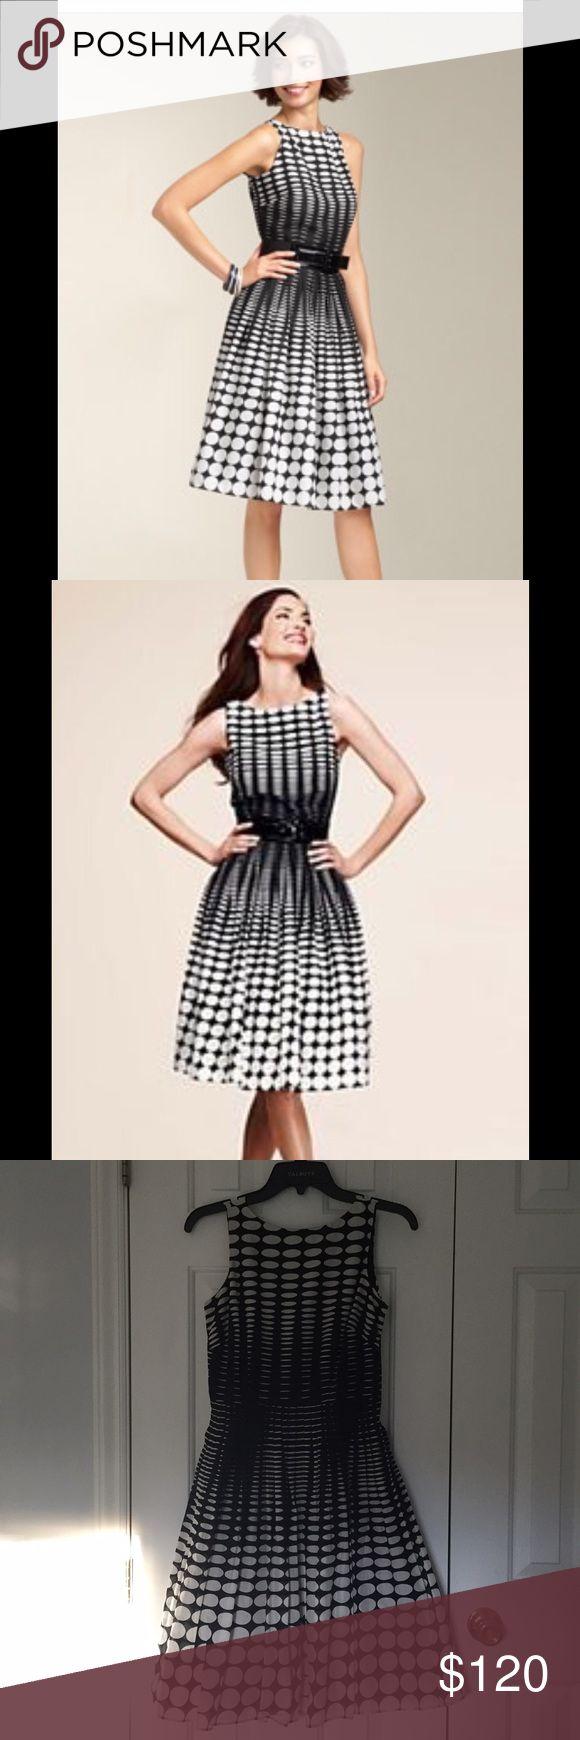 Talbots Classic Black and White Dress! Petite women's black and white sleeveless summer dress! Talbots Dresses